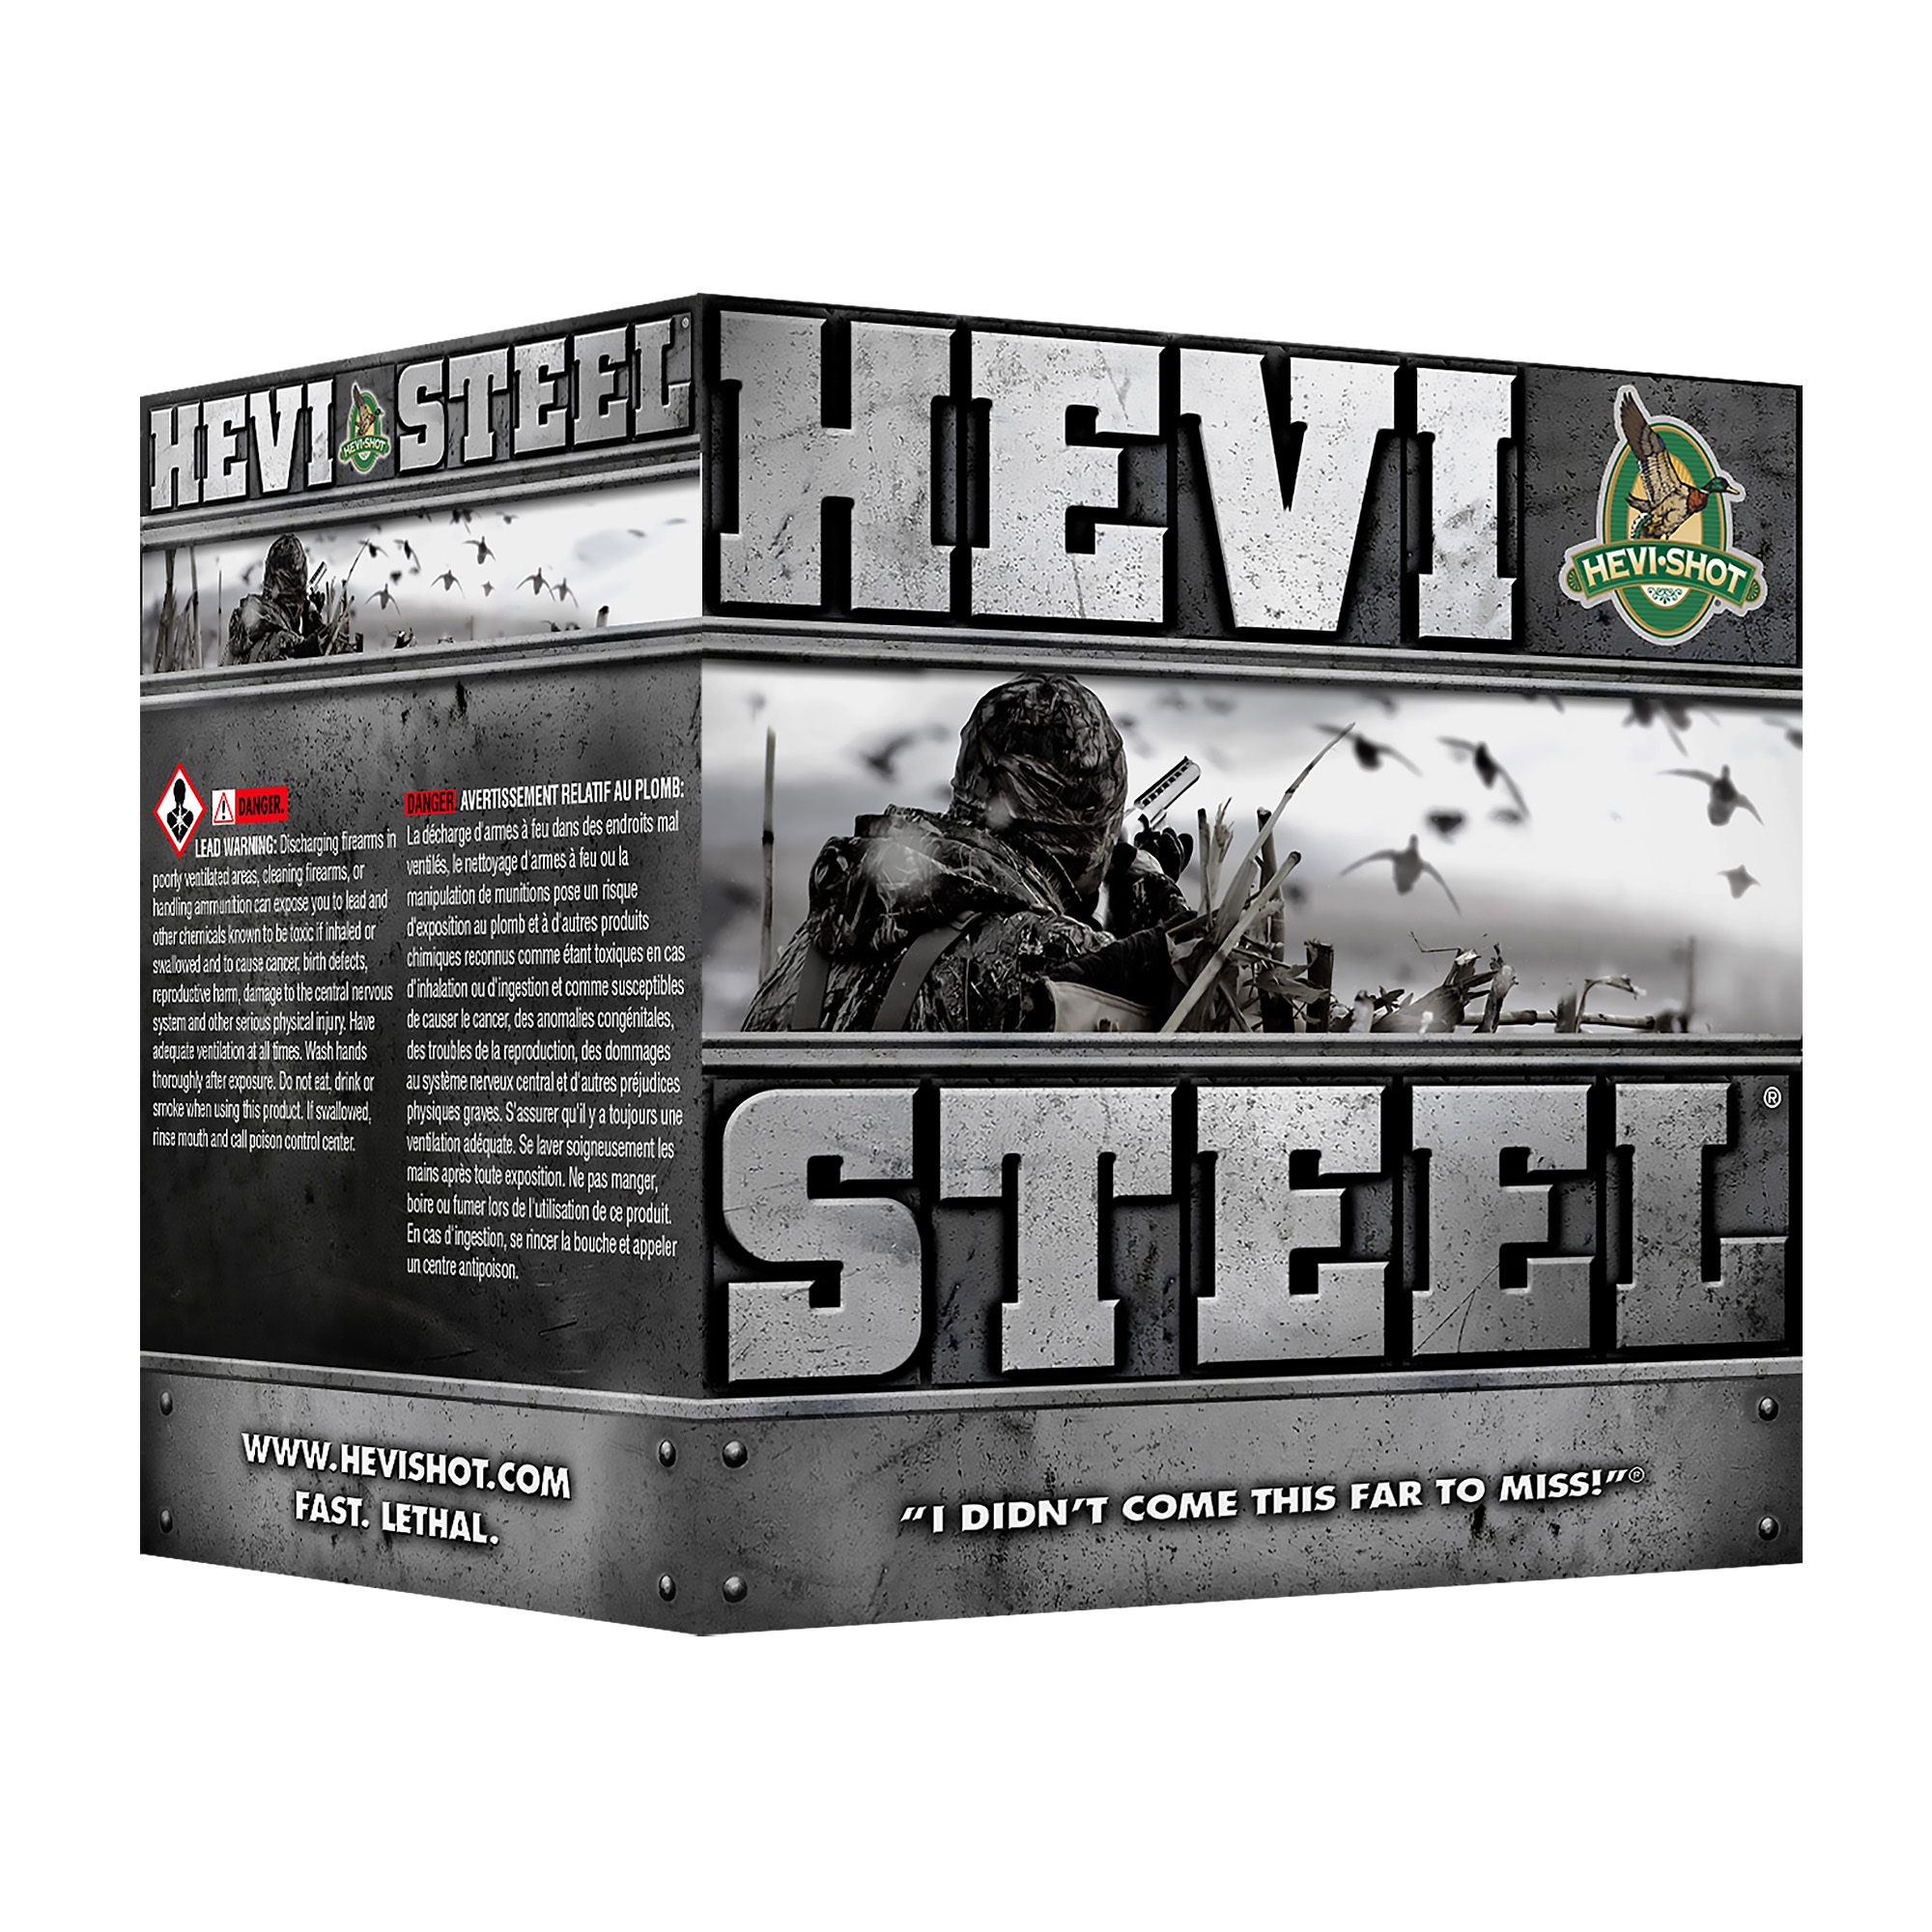 "Hevi Steel 12ga 3.5"" #2 25/250"